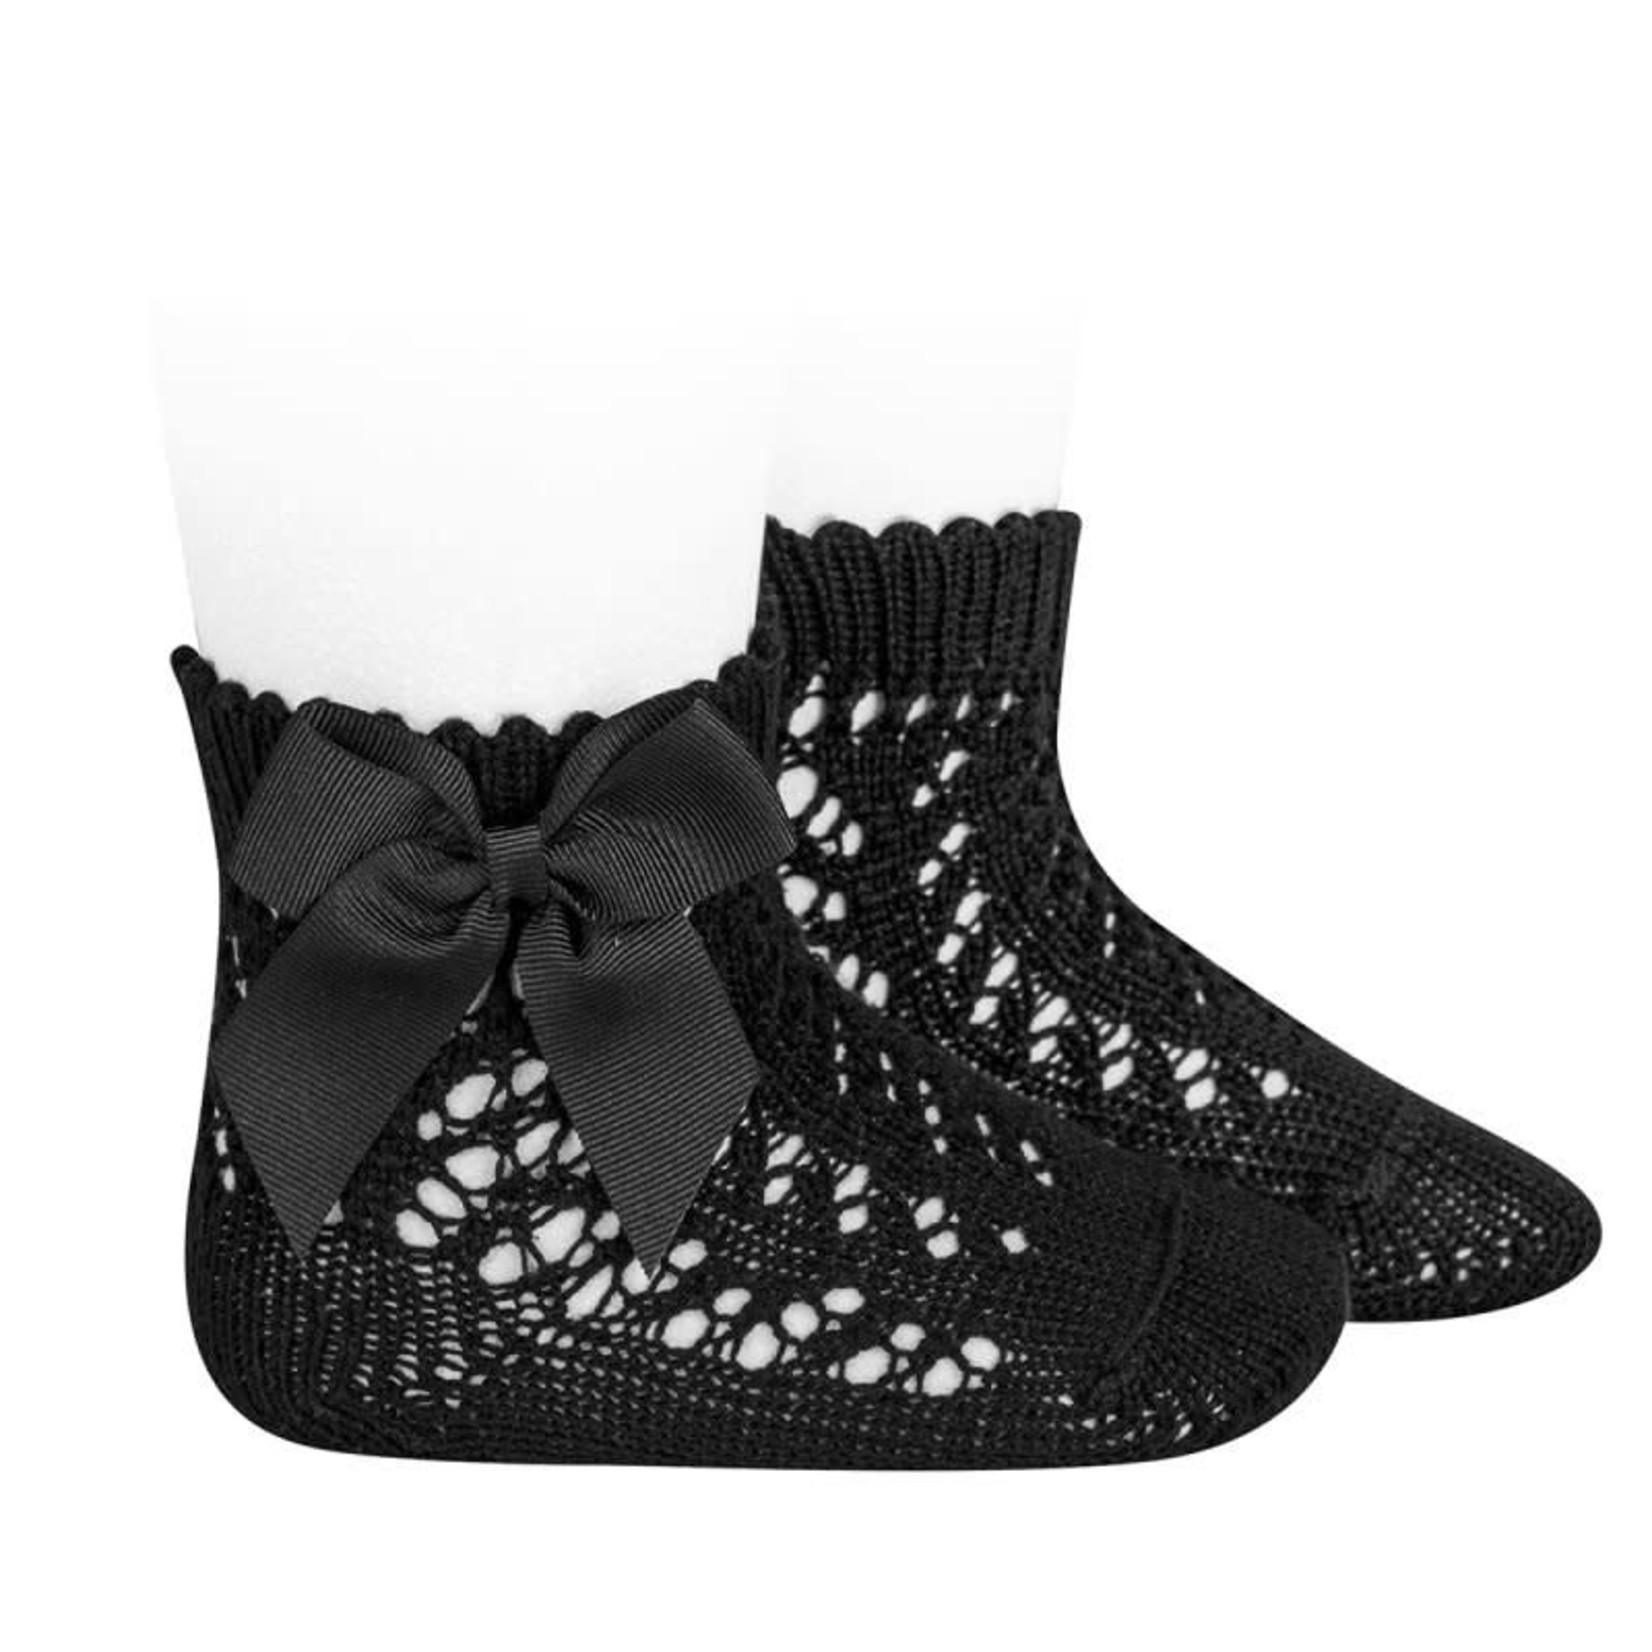 Condor Socks Open w/Bow - Black